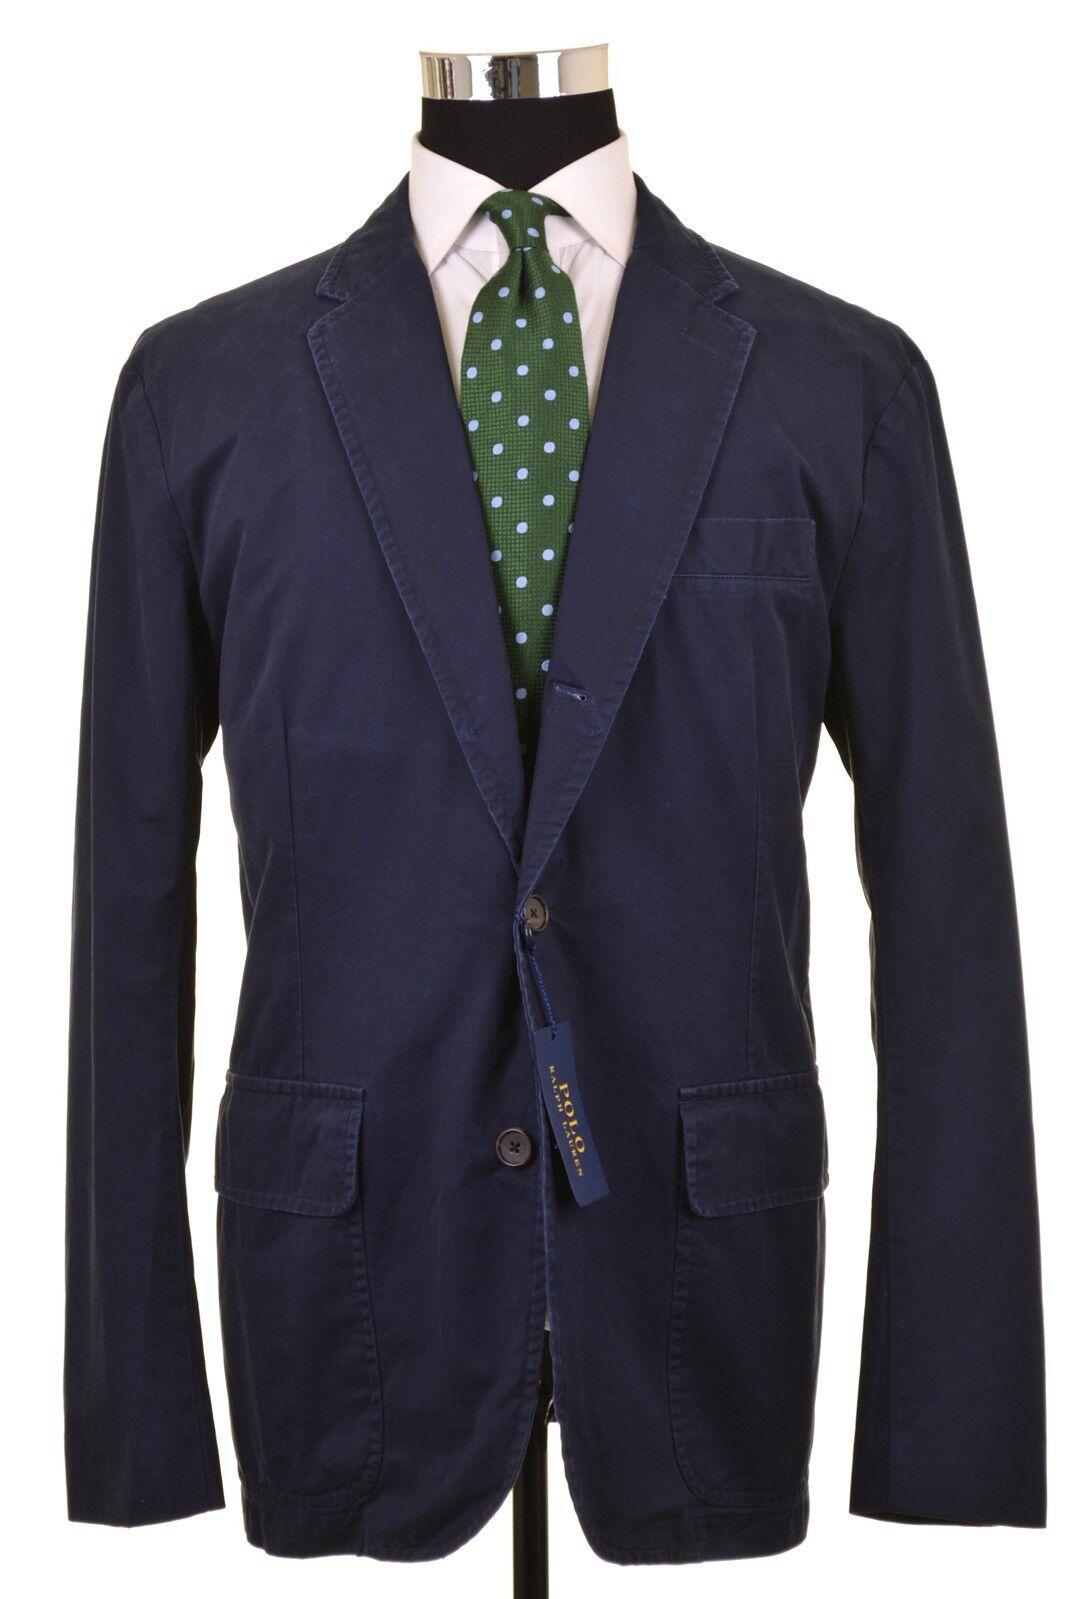 NEW Current Model Polo Ralph Lauren Garment Dyed Navy Cotton Blazer Coat XL NWT